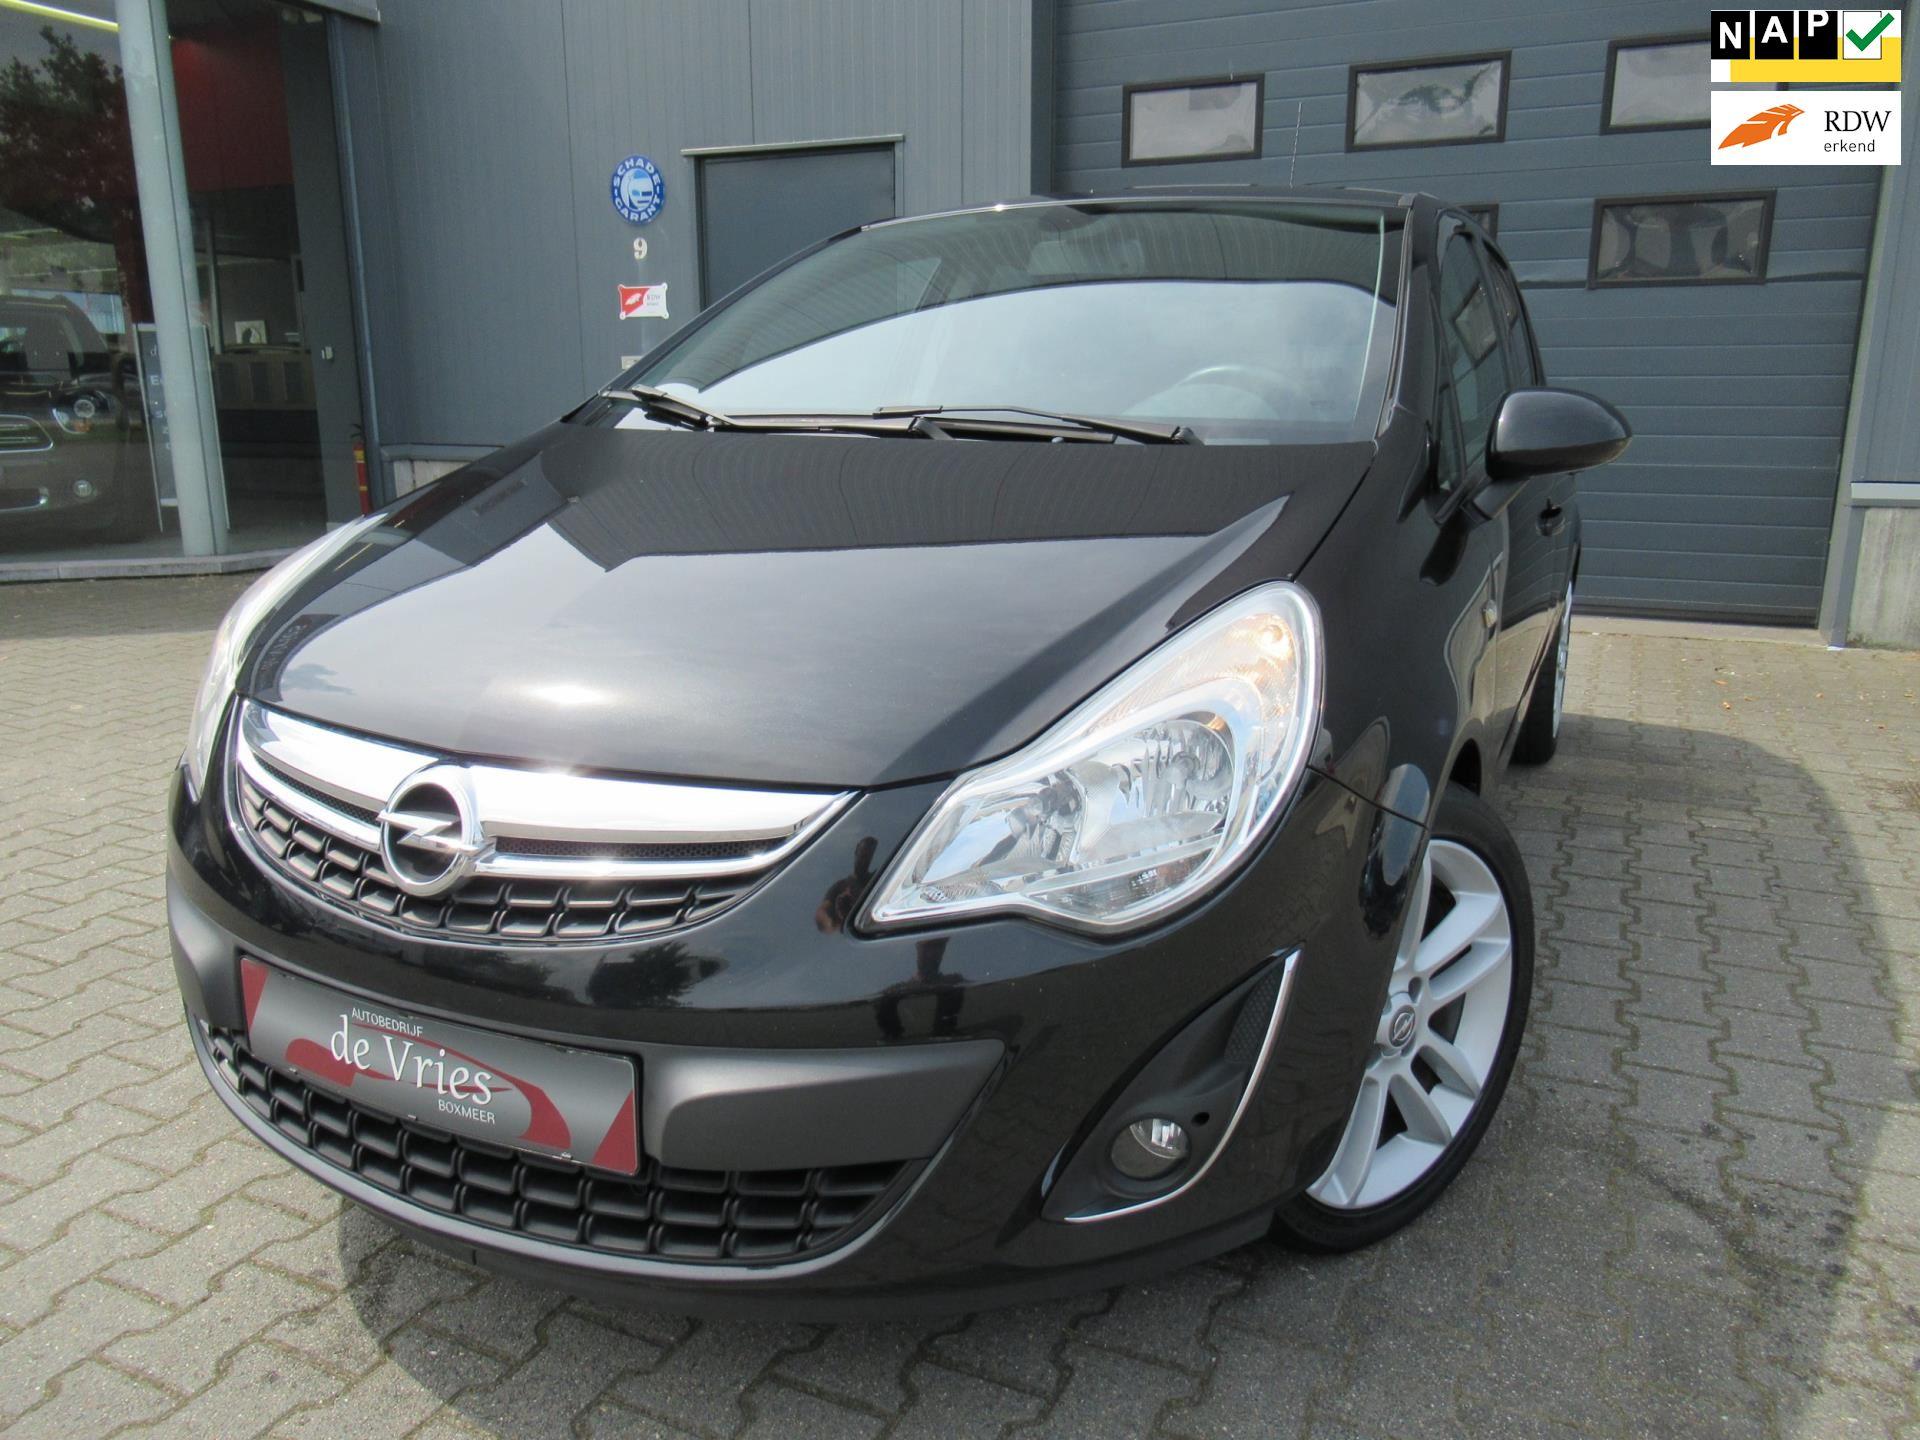 Opel Corsa occasion - Autobedrijf de Vries Boxmeer